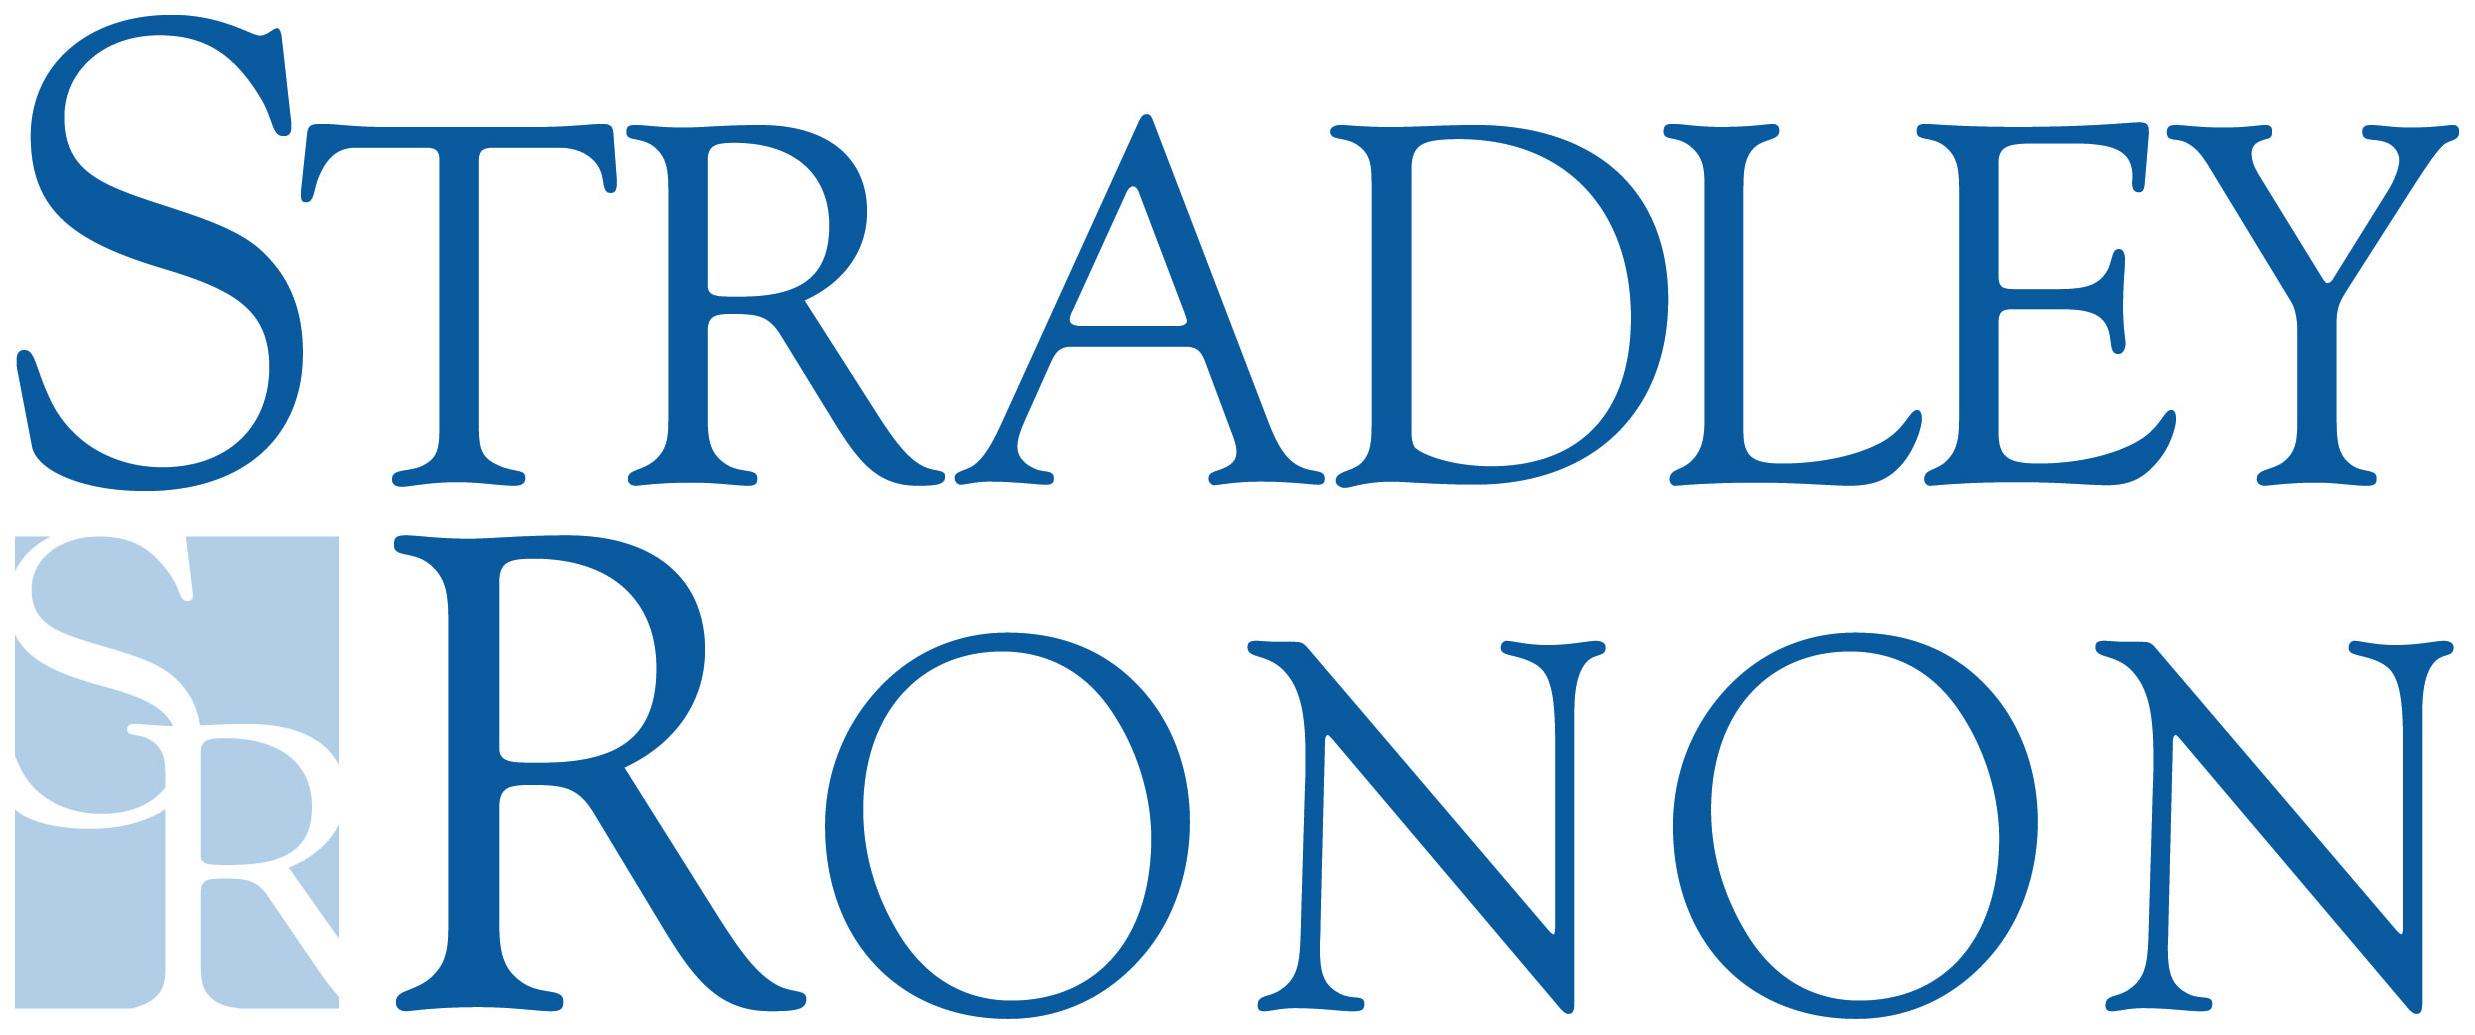 StradRon-noAALwording-647wScreen